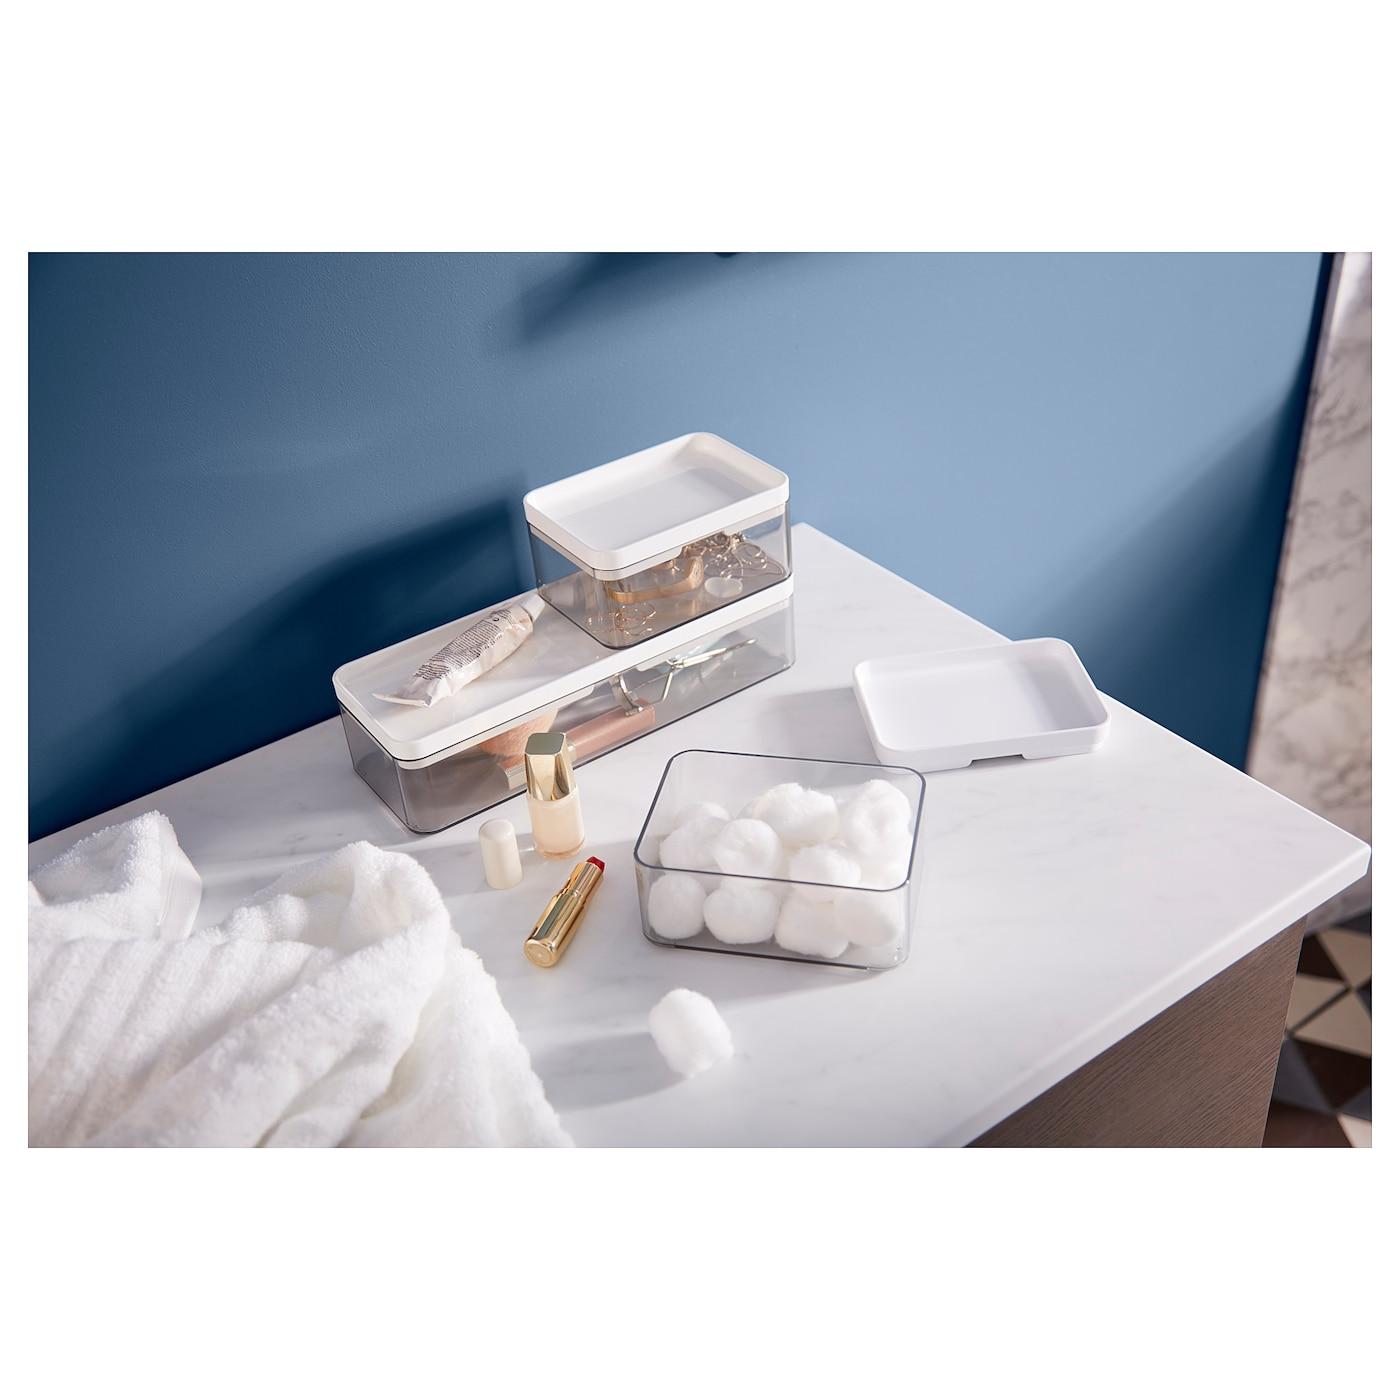 BROGRUND صندوق، طقم من 3, رمادي شفاف/أبيض